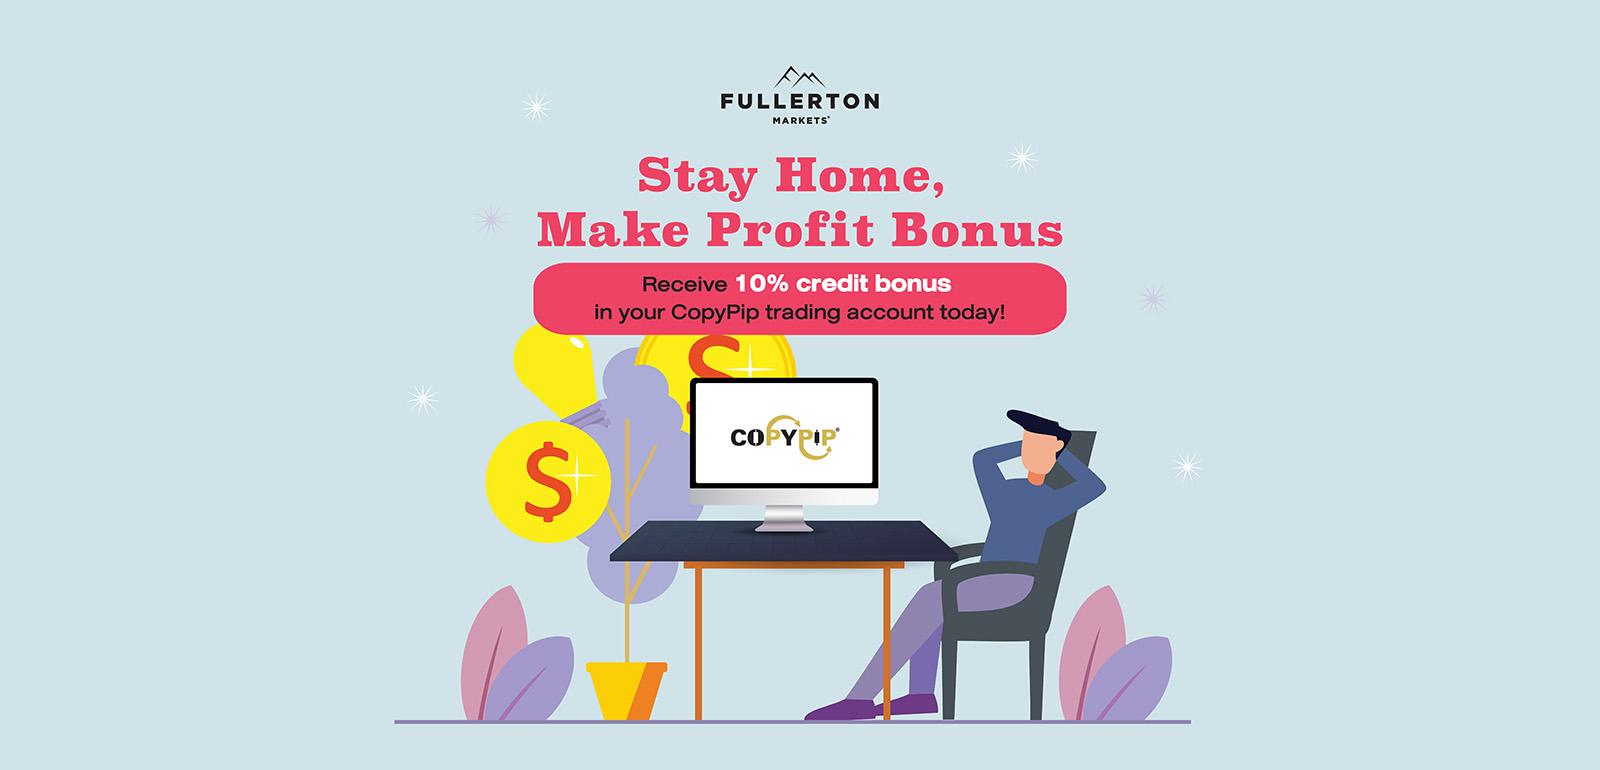 Stay Home Make Profit Bonus